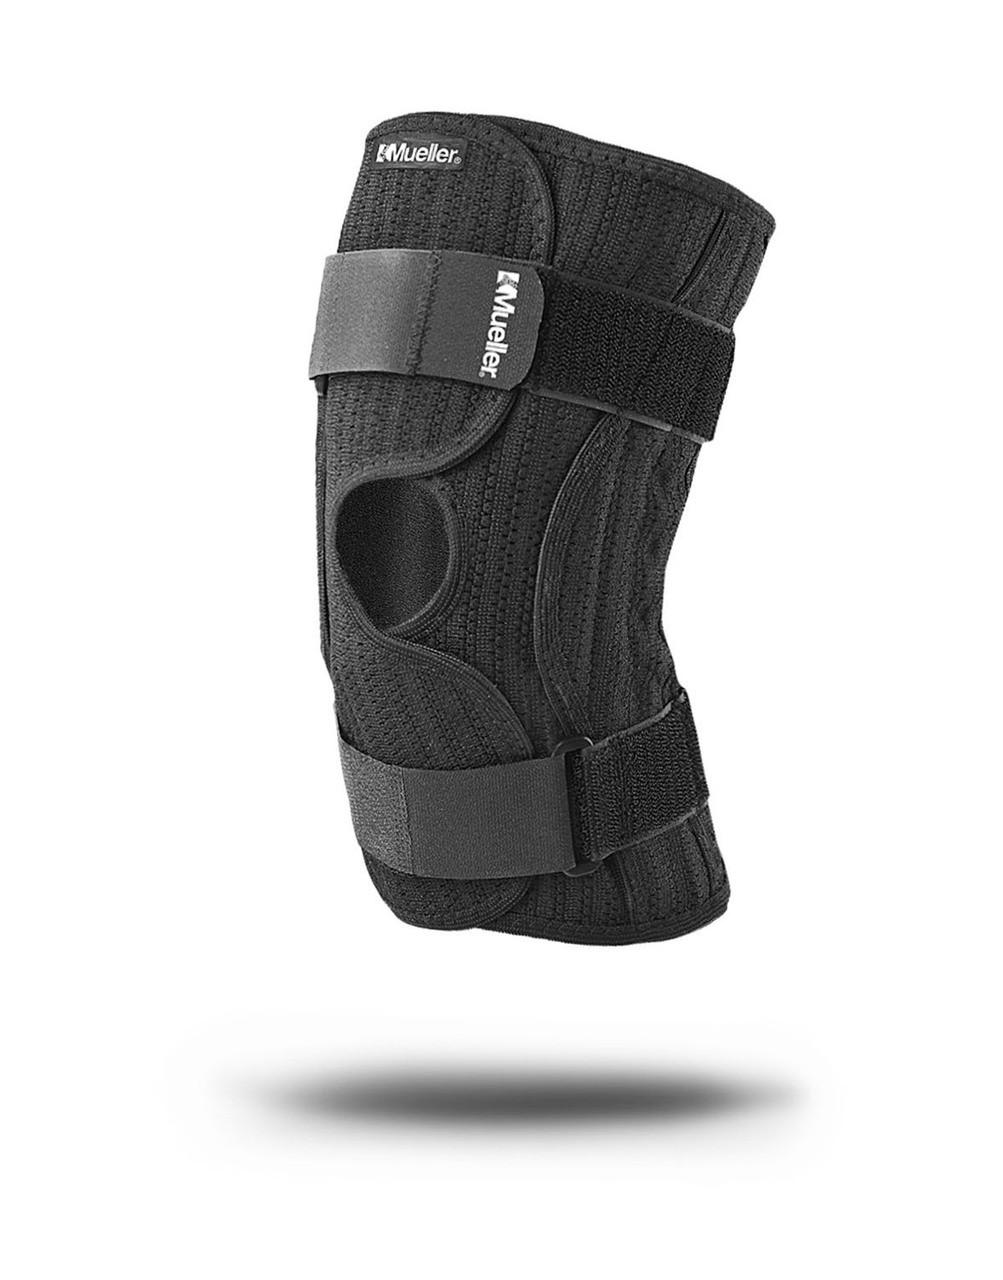 Mueller Elastic Knee Brace, Black, Small/Medium